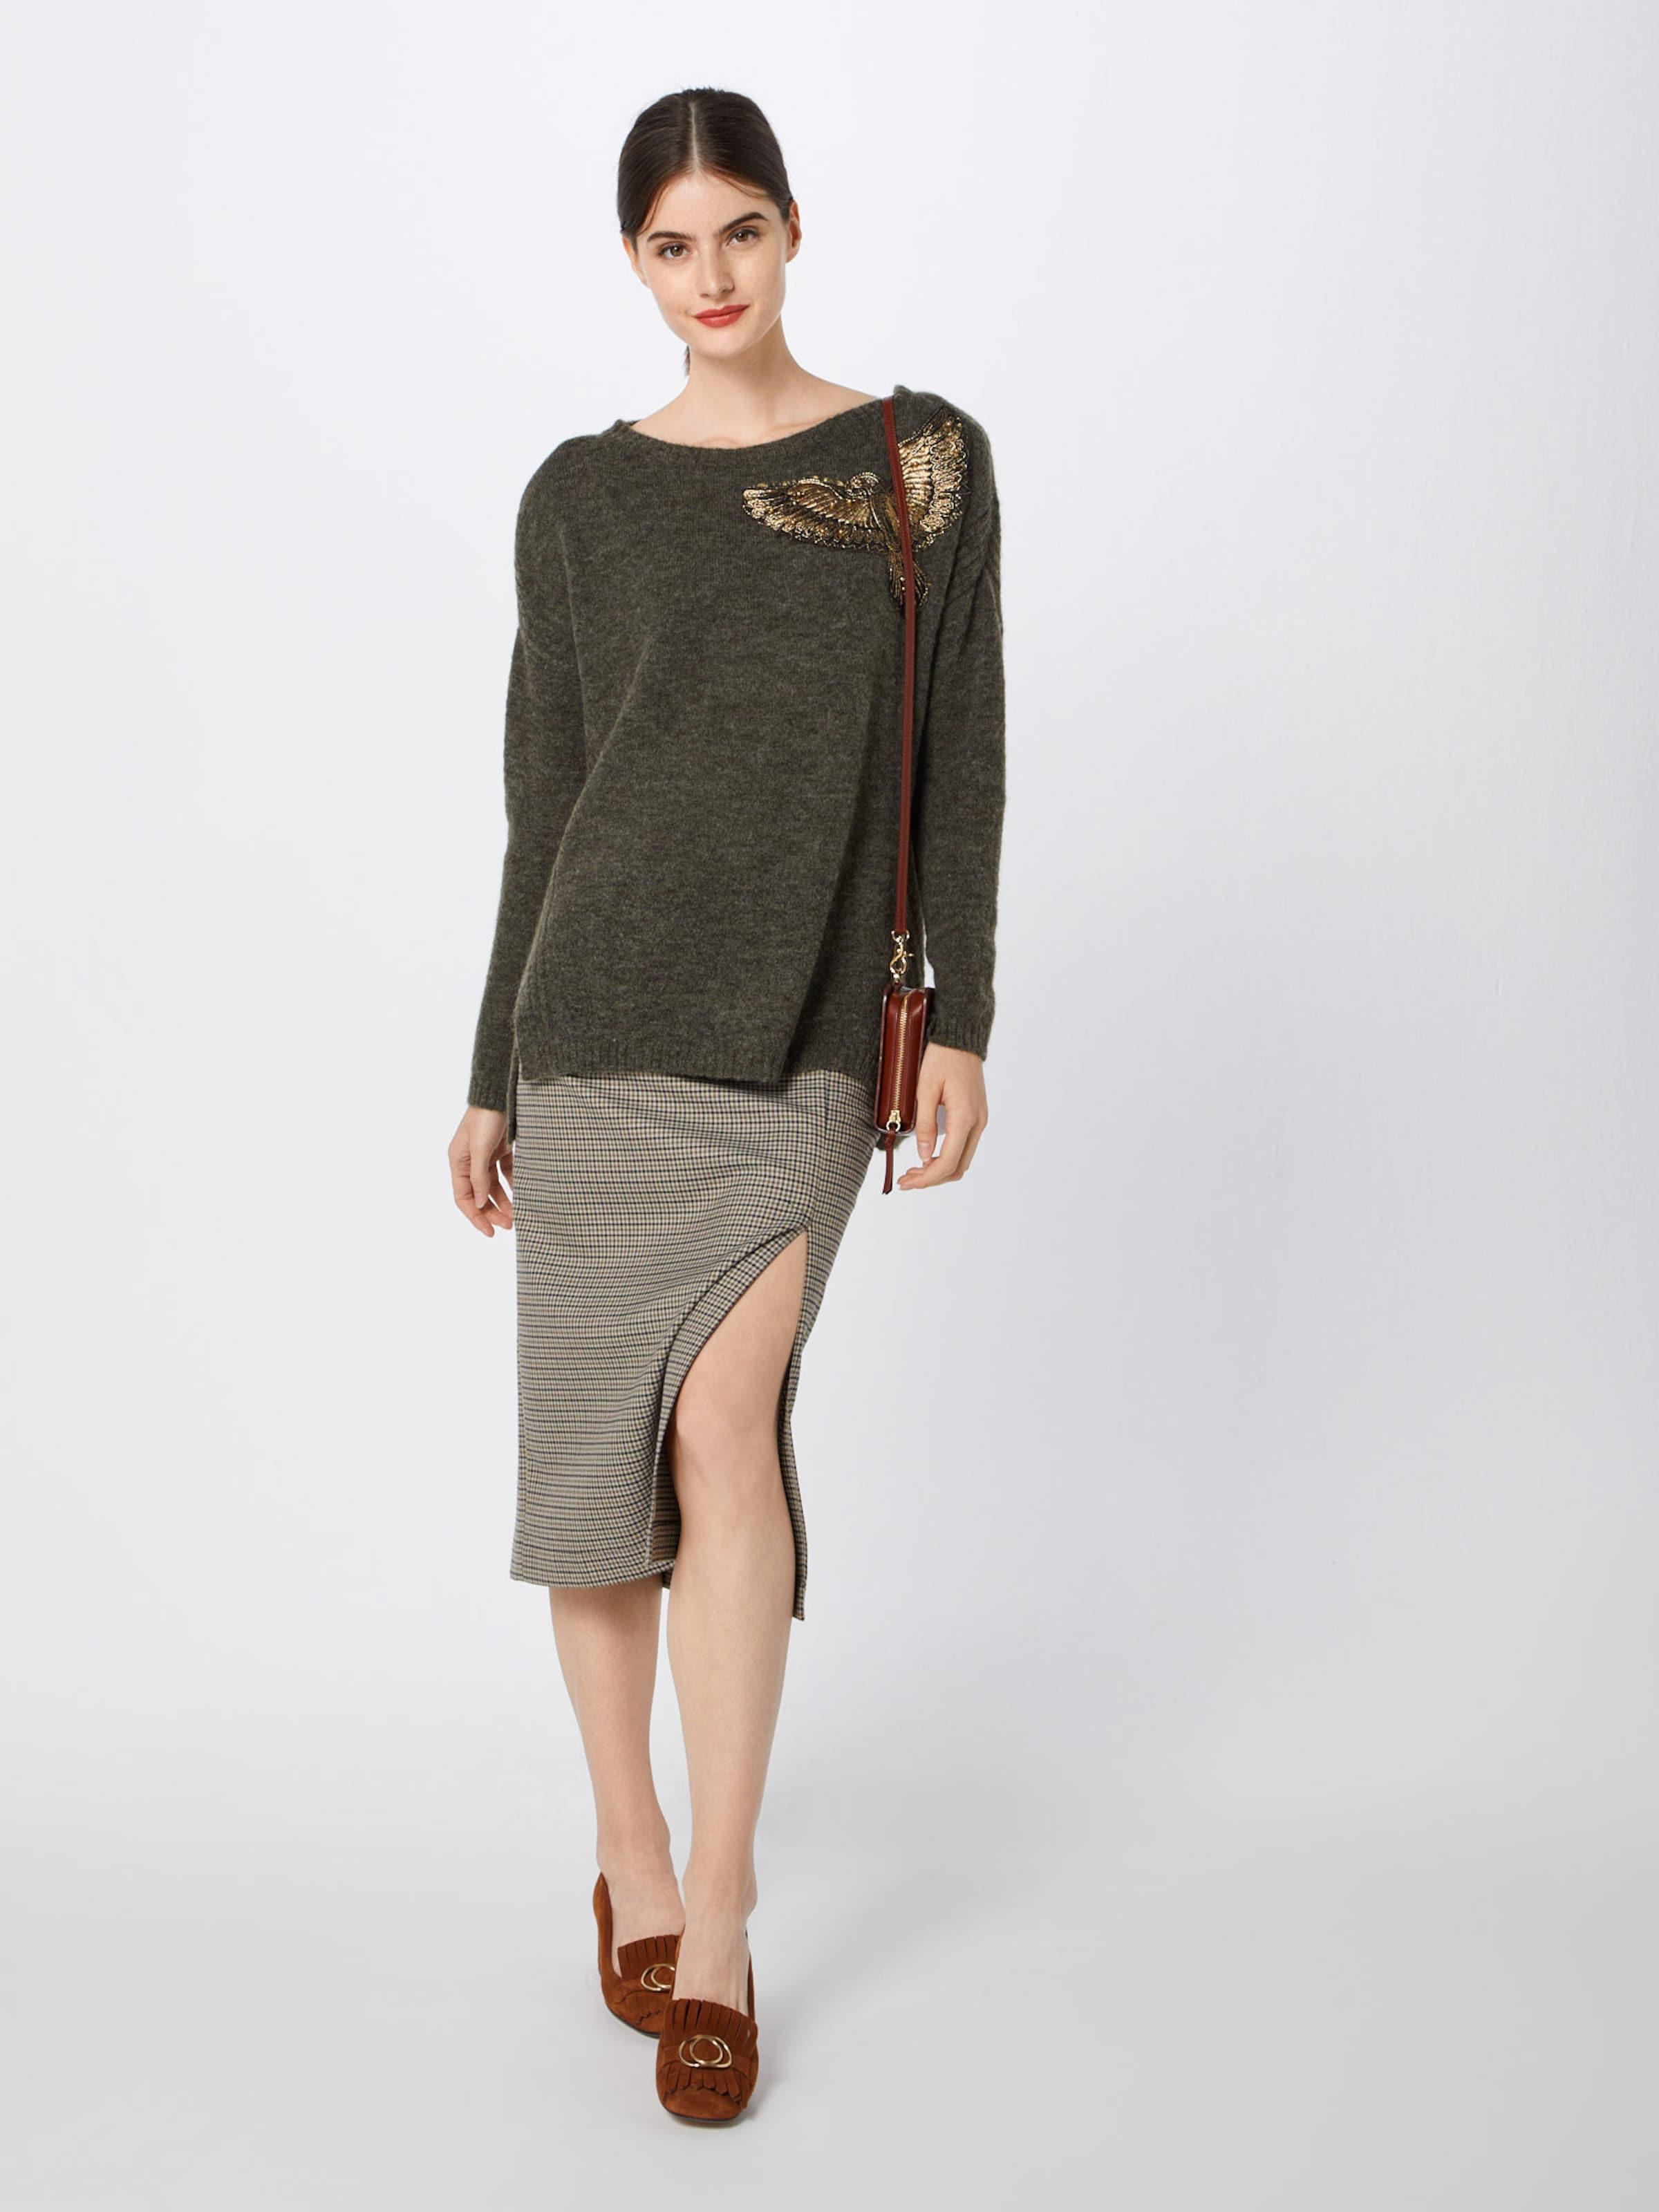 Pullover Pullover In 'titika' 'titika' Khaki Culture Pullover Culture In Culture 'titika' Khaki EDH9YW2I